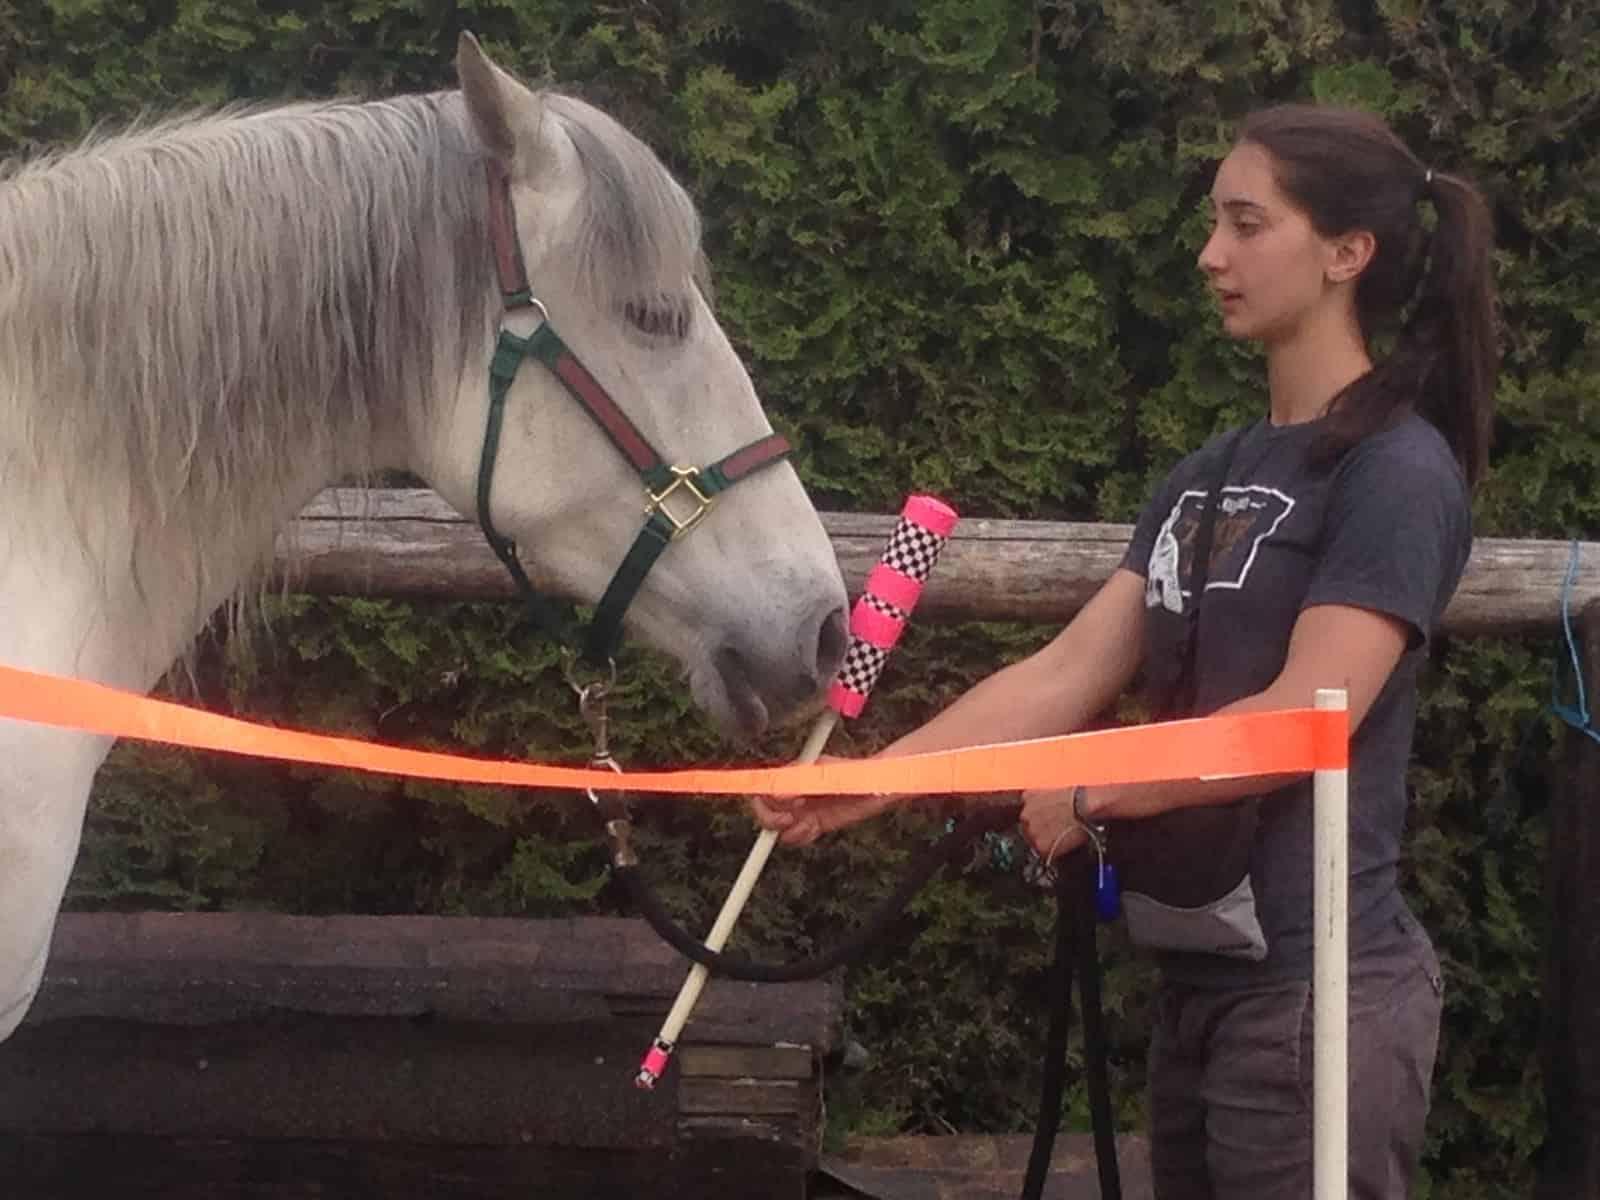 Does Target Training Help Reduce Horses' Stress?